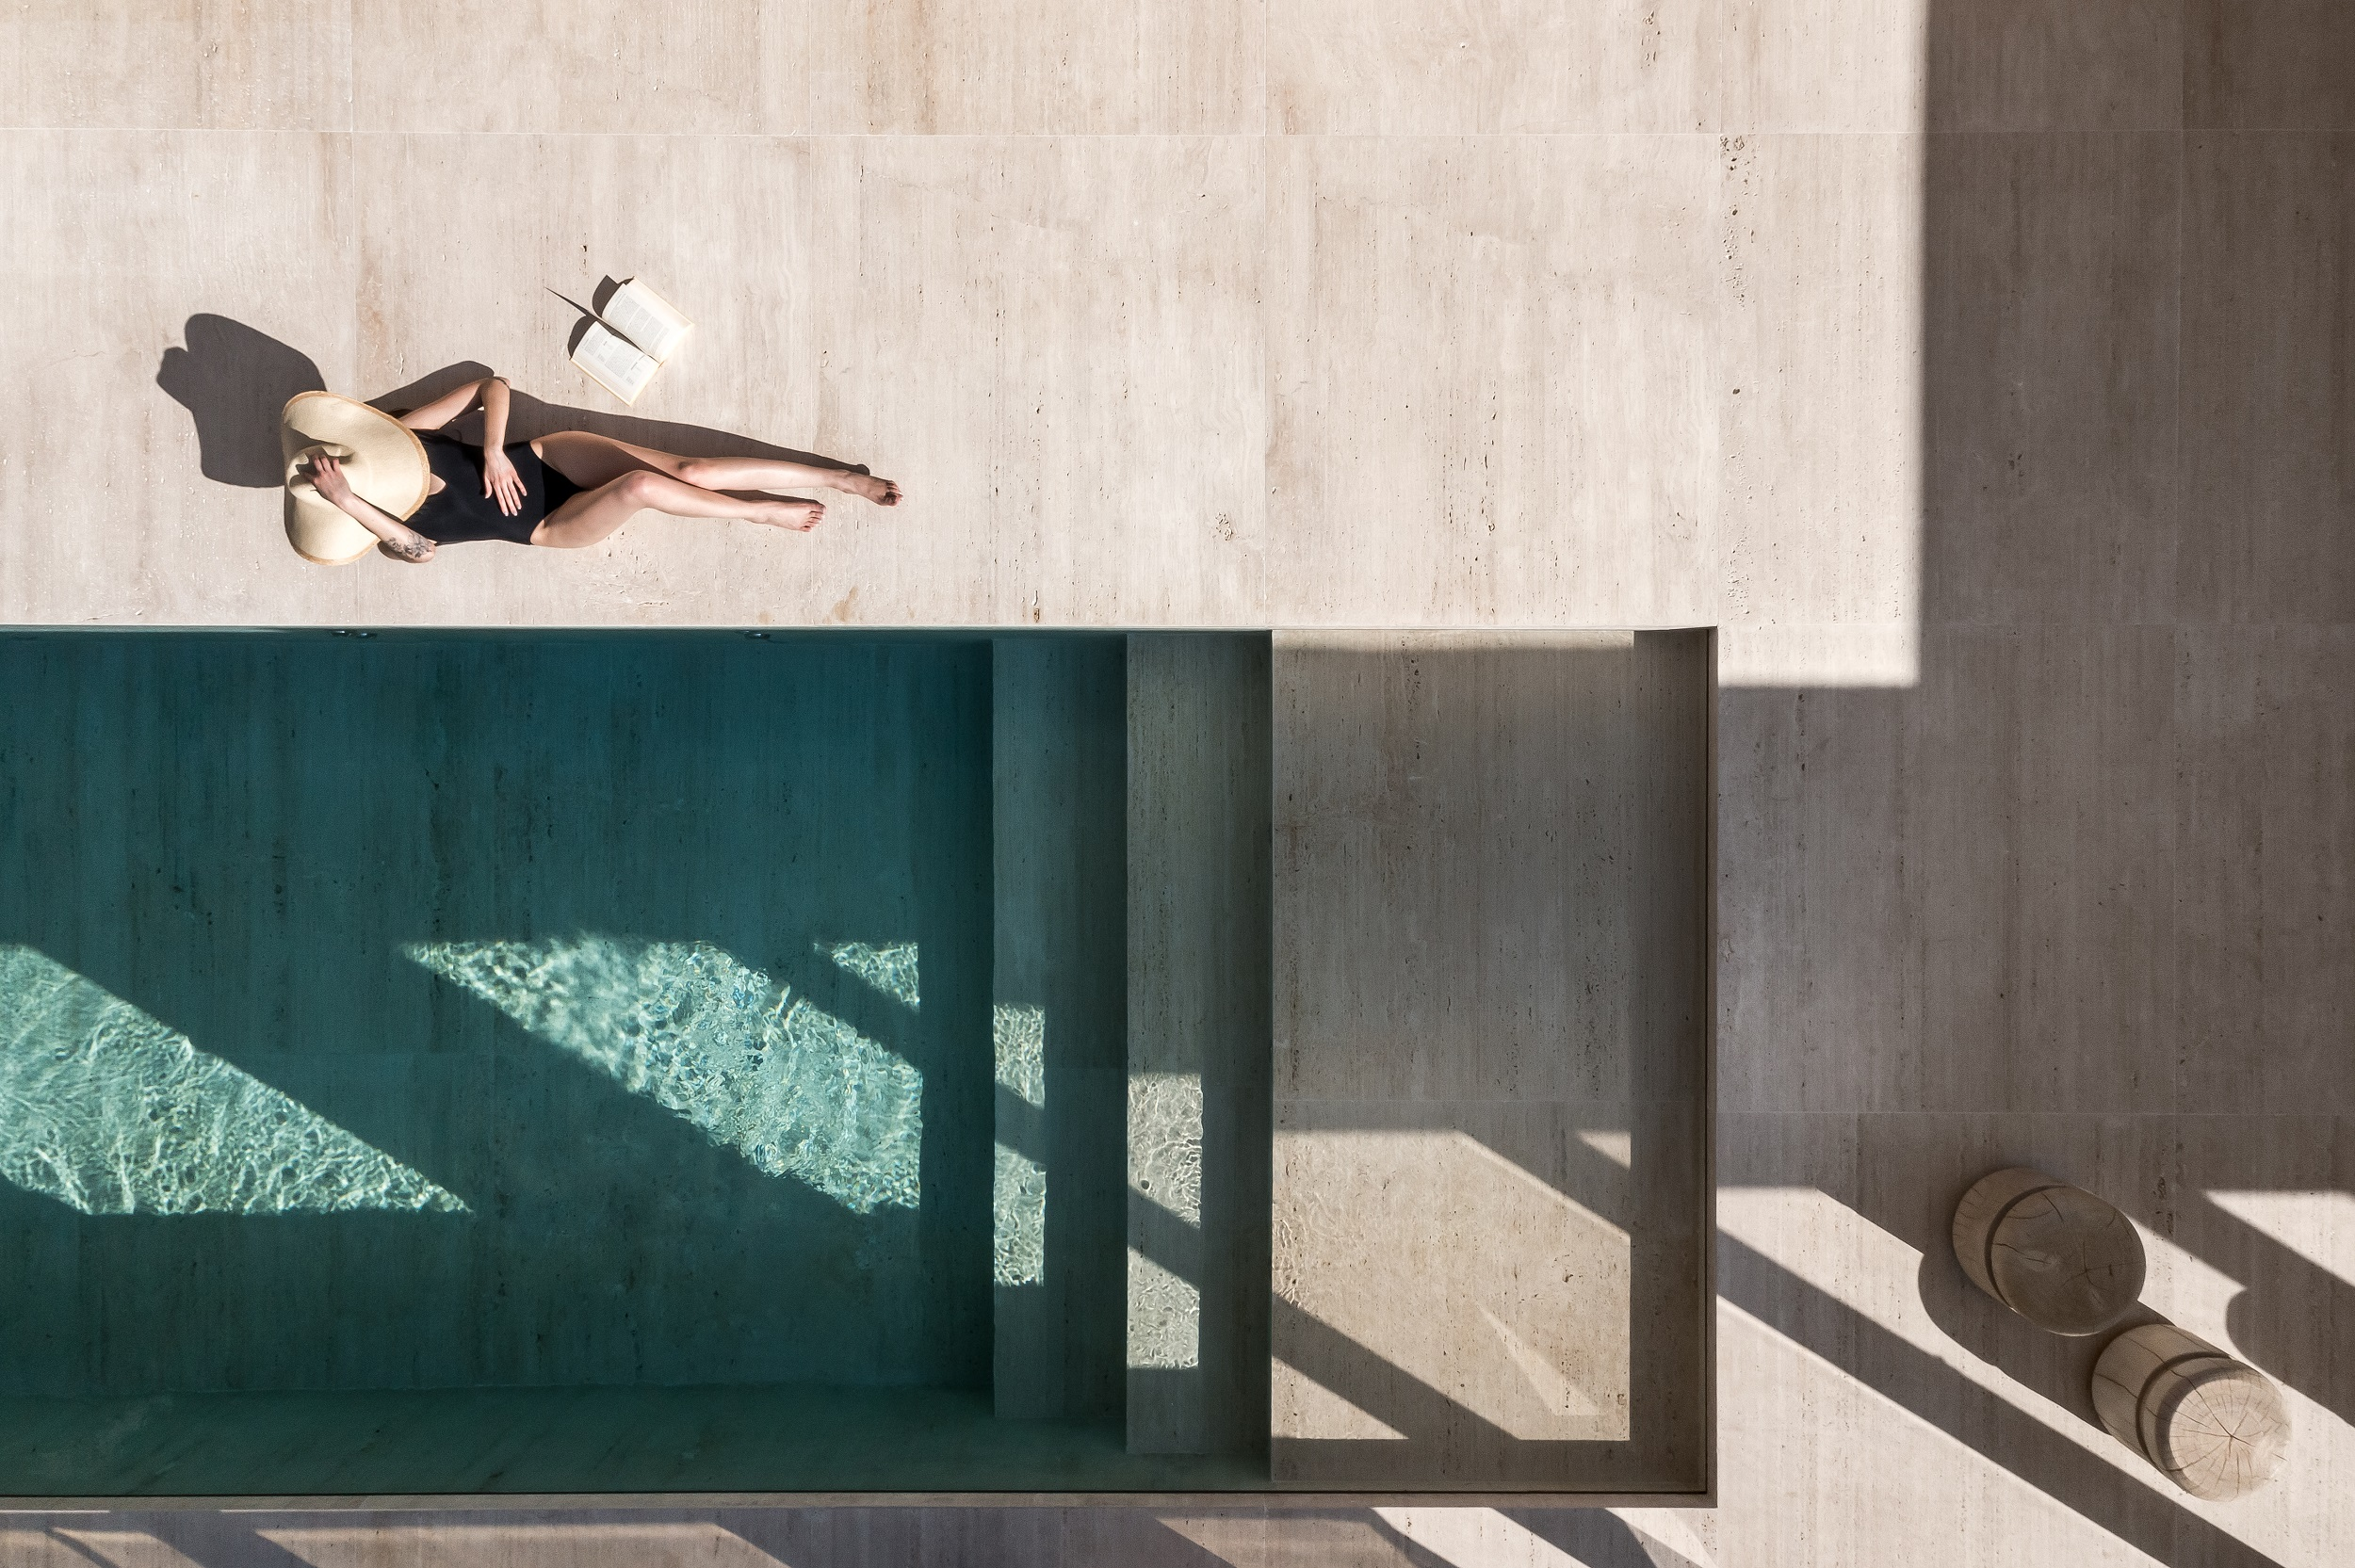 Projeto da arquiteta Priscilla Muller usa o Travertino Navona, da NPK Mármores